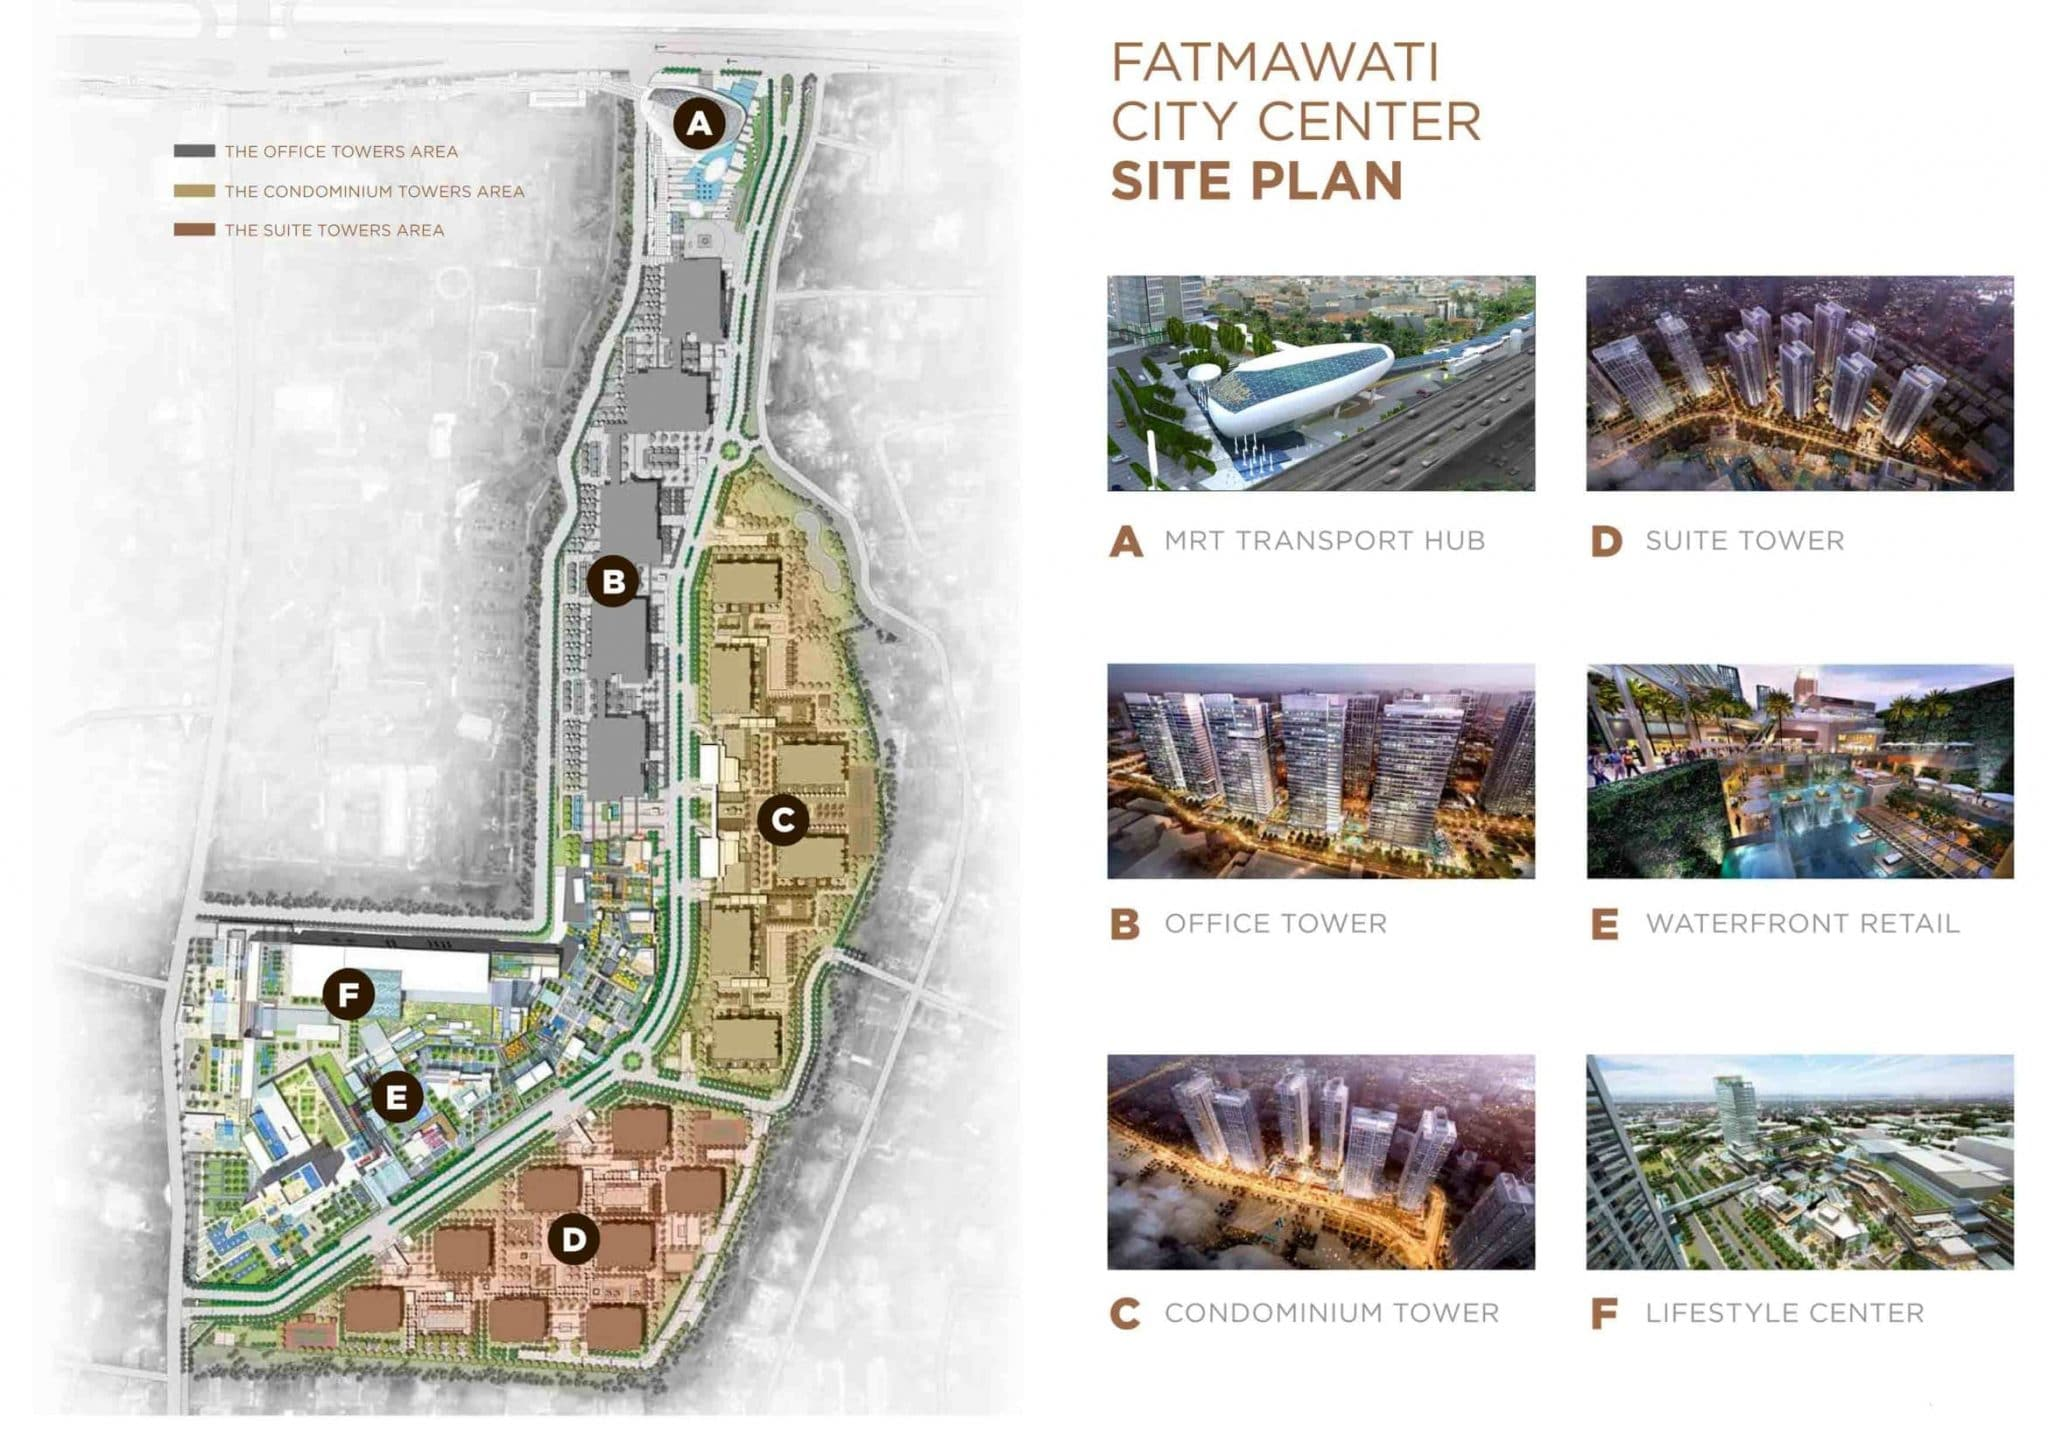 Site-plan-Fatmawati-City-Center-scaled